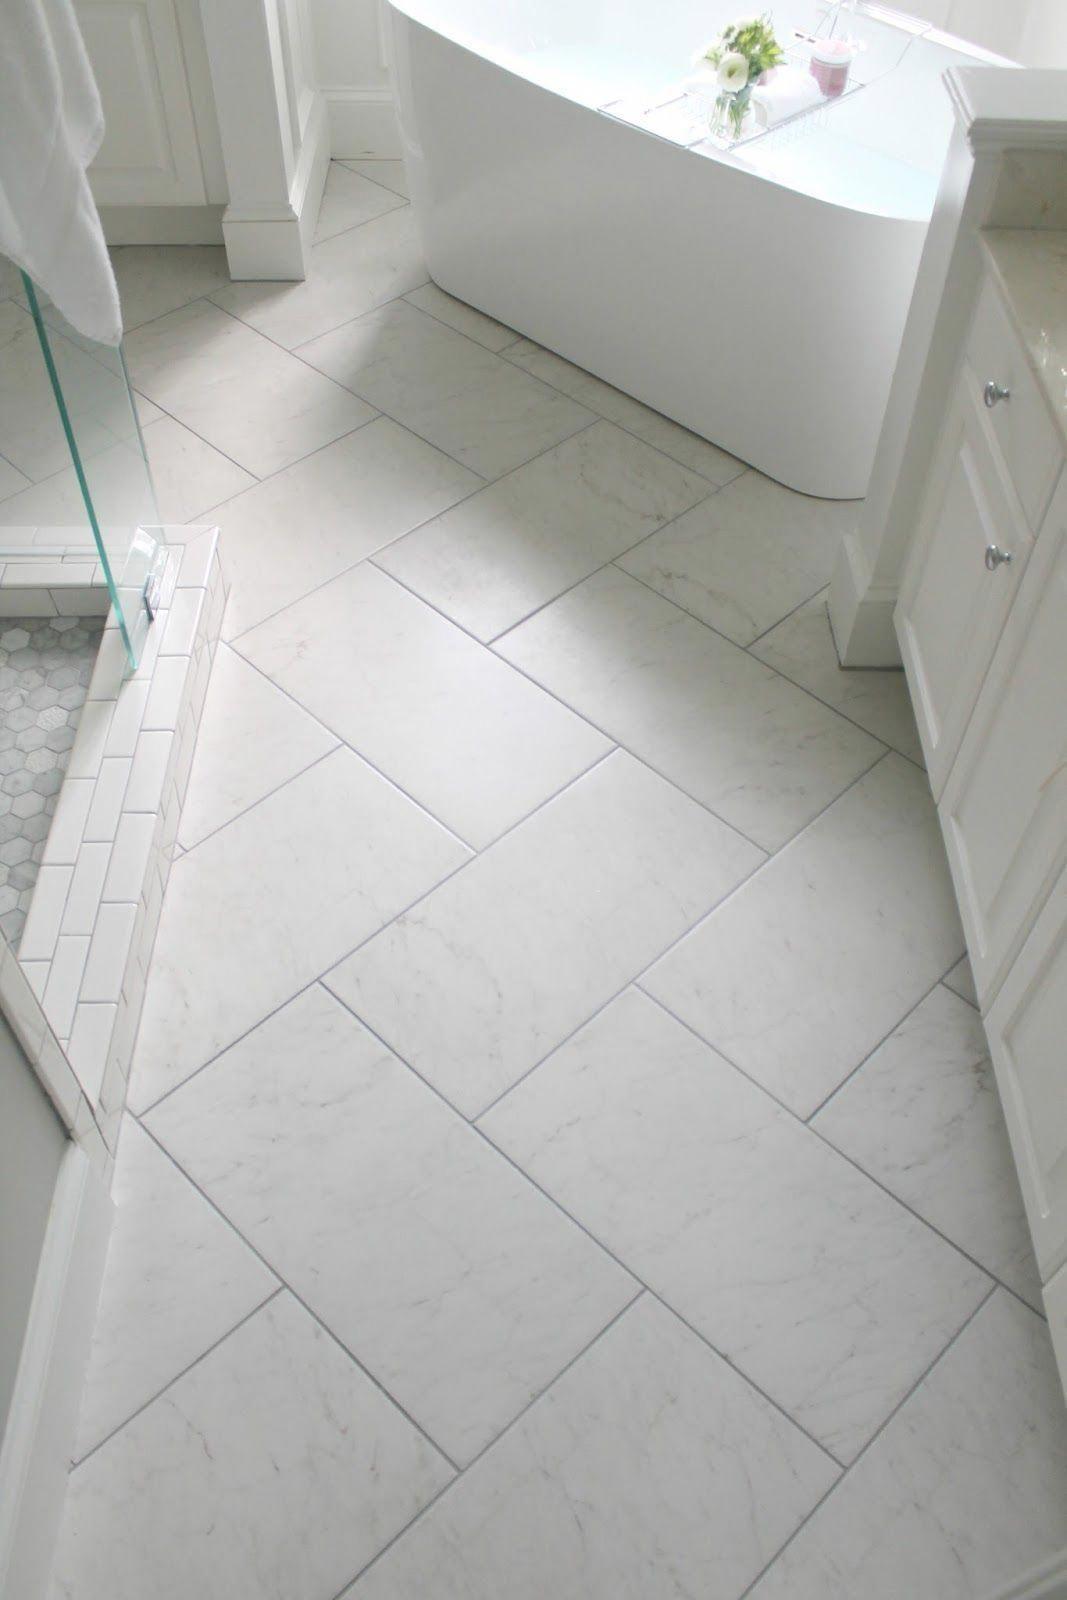 25 Unique Bathroom Floor Tiles Ideas For Small Bathrooms With